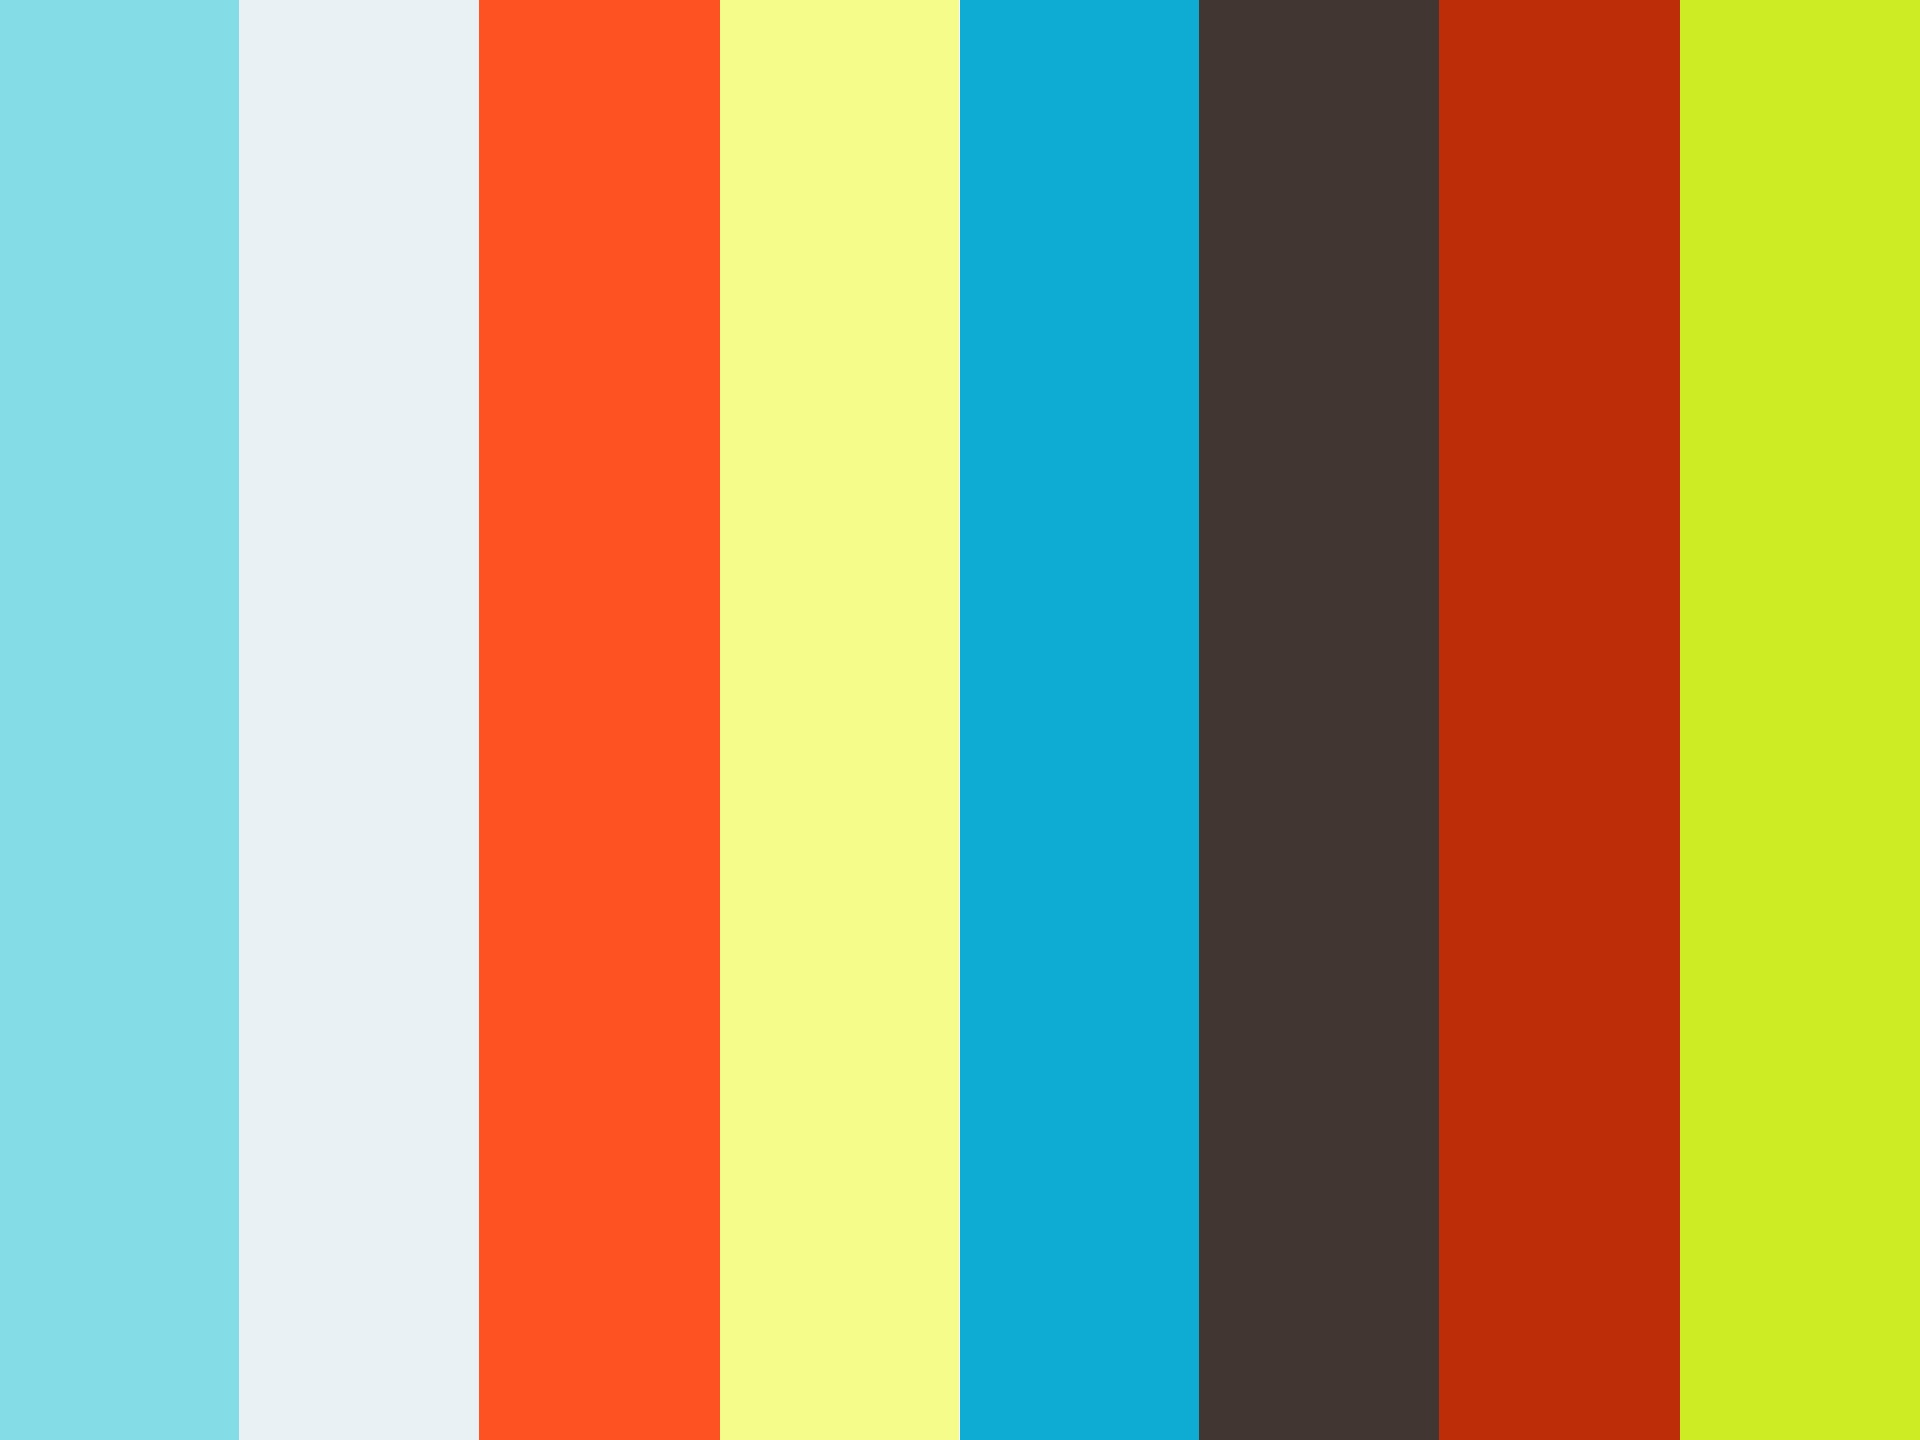 97 Baddest 47 X Shilole - Nikagongee Remix (Deejay Ejay's EXT) on Vimeo